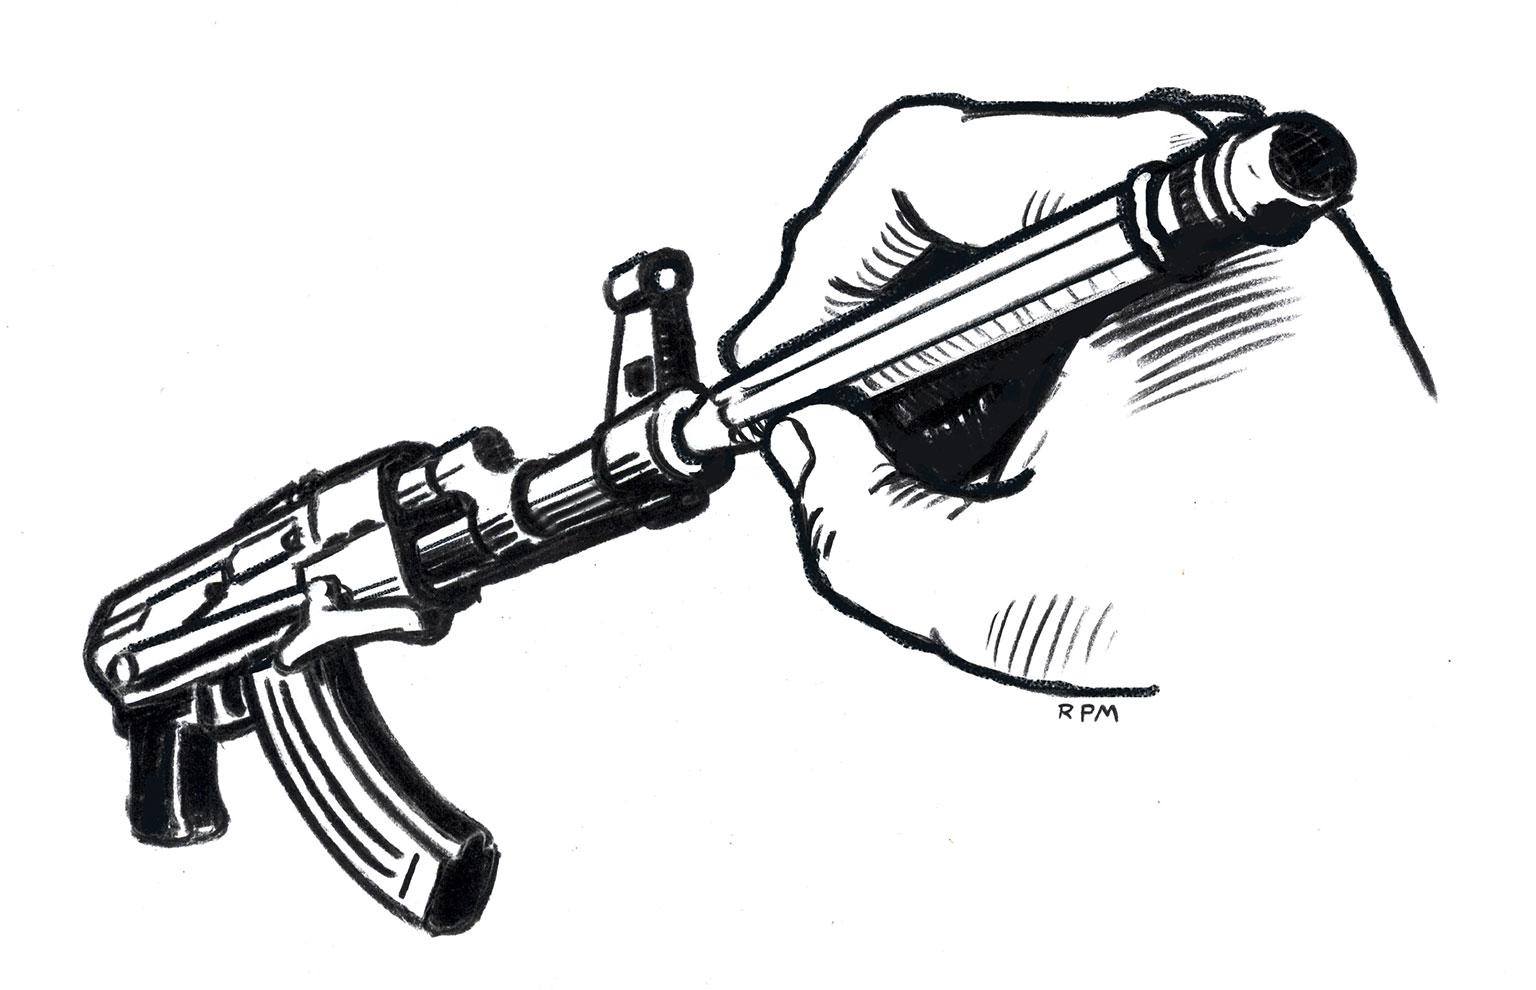 Illustration by Ross MacDonald